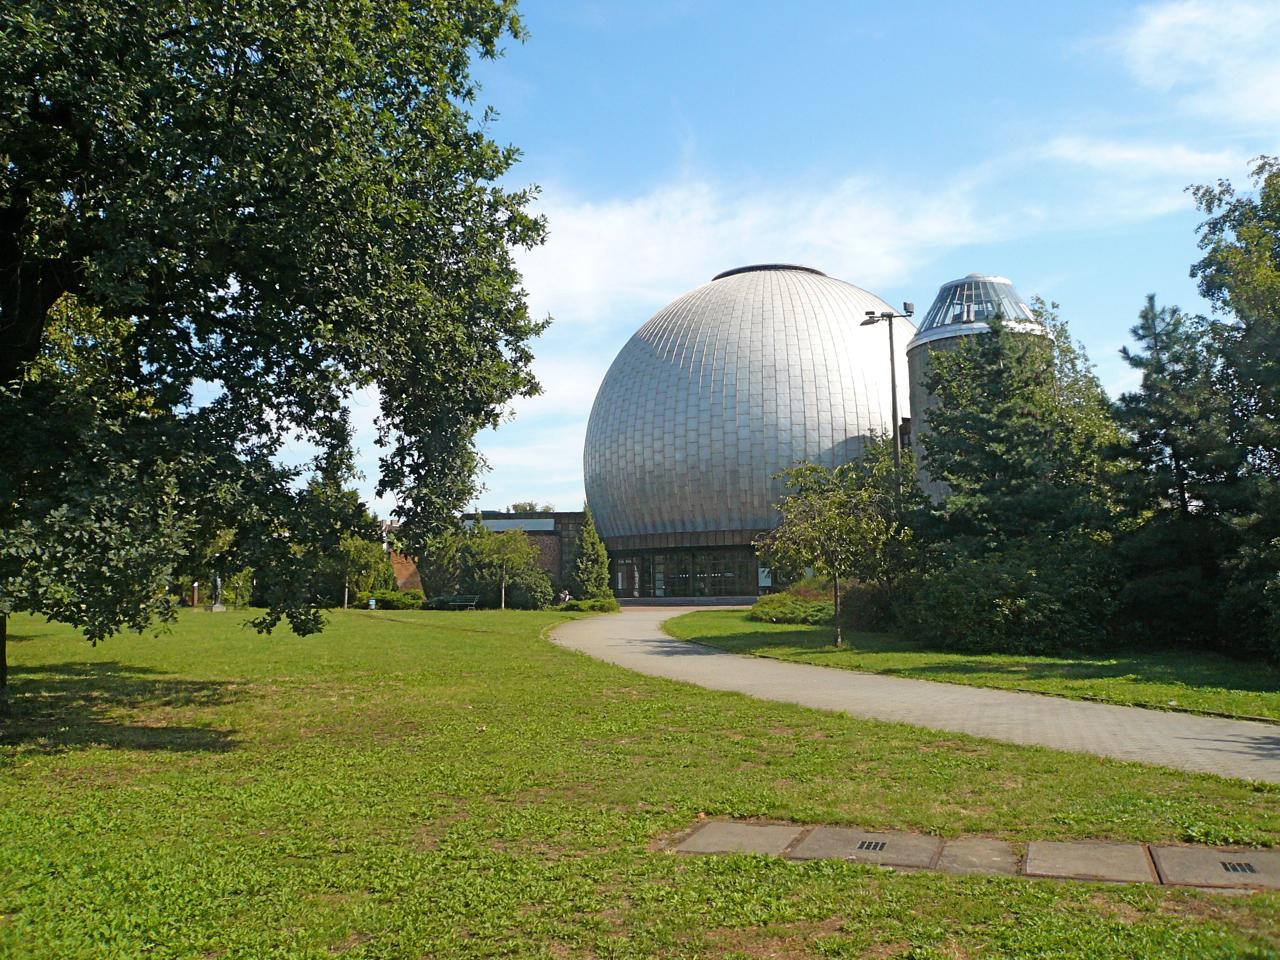 zeiss-grosplanetarium-berlin-prenzlauer-berg-weit